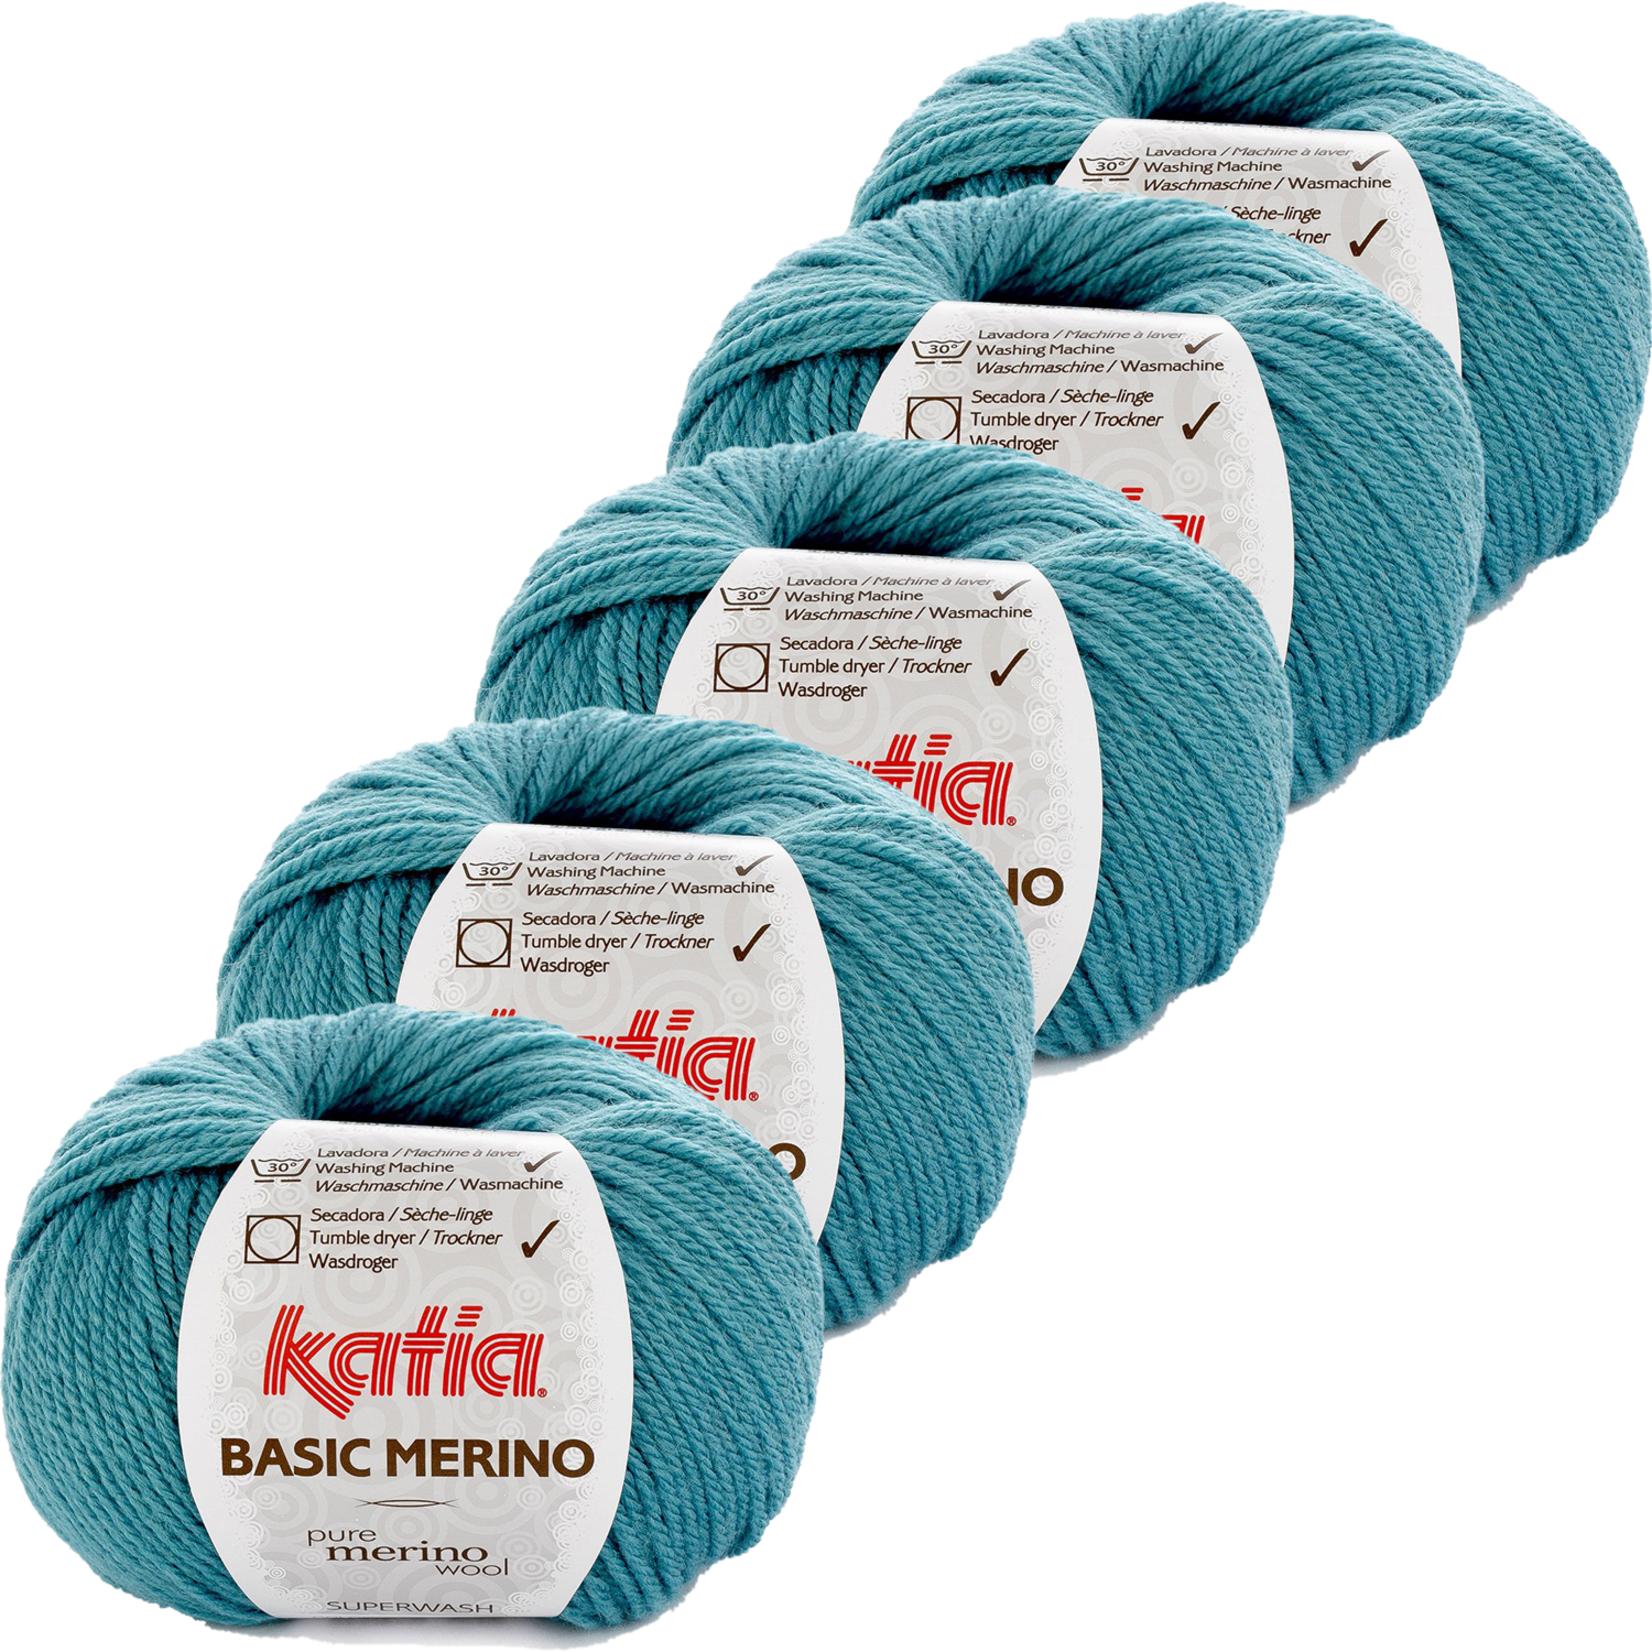 Katia Basic Merino - kleur 30_Turquoise - bundel 5 bollen 50 gr.  van 120 m.